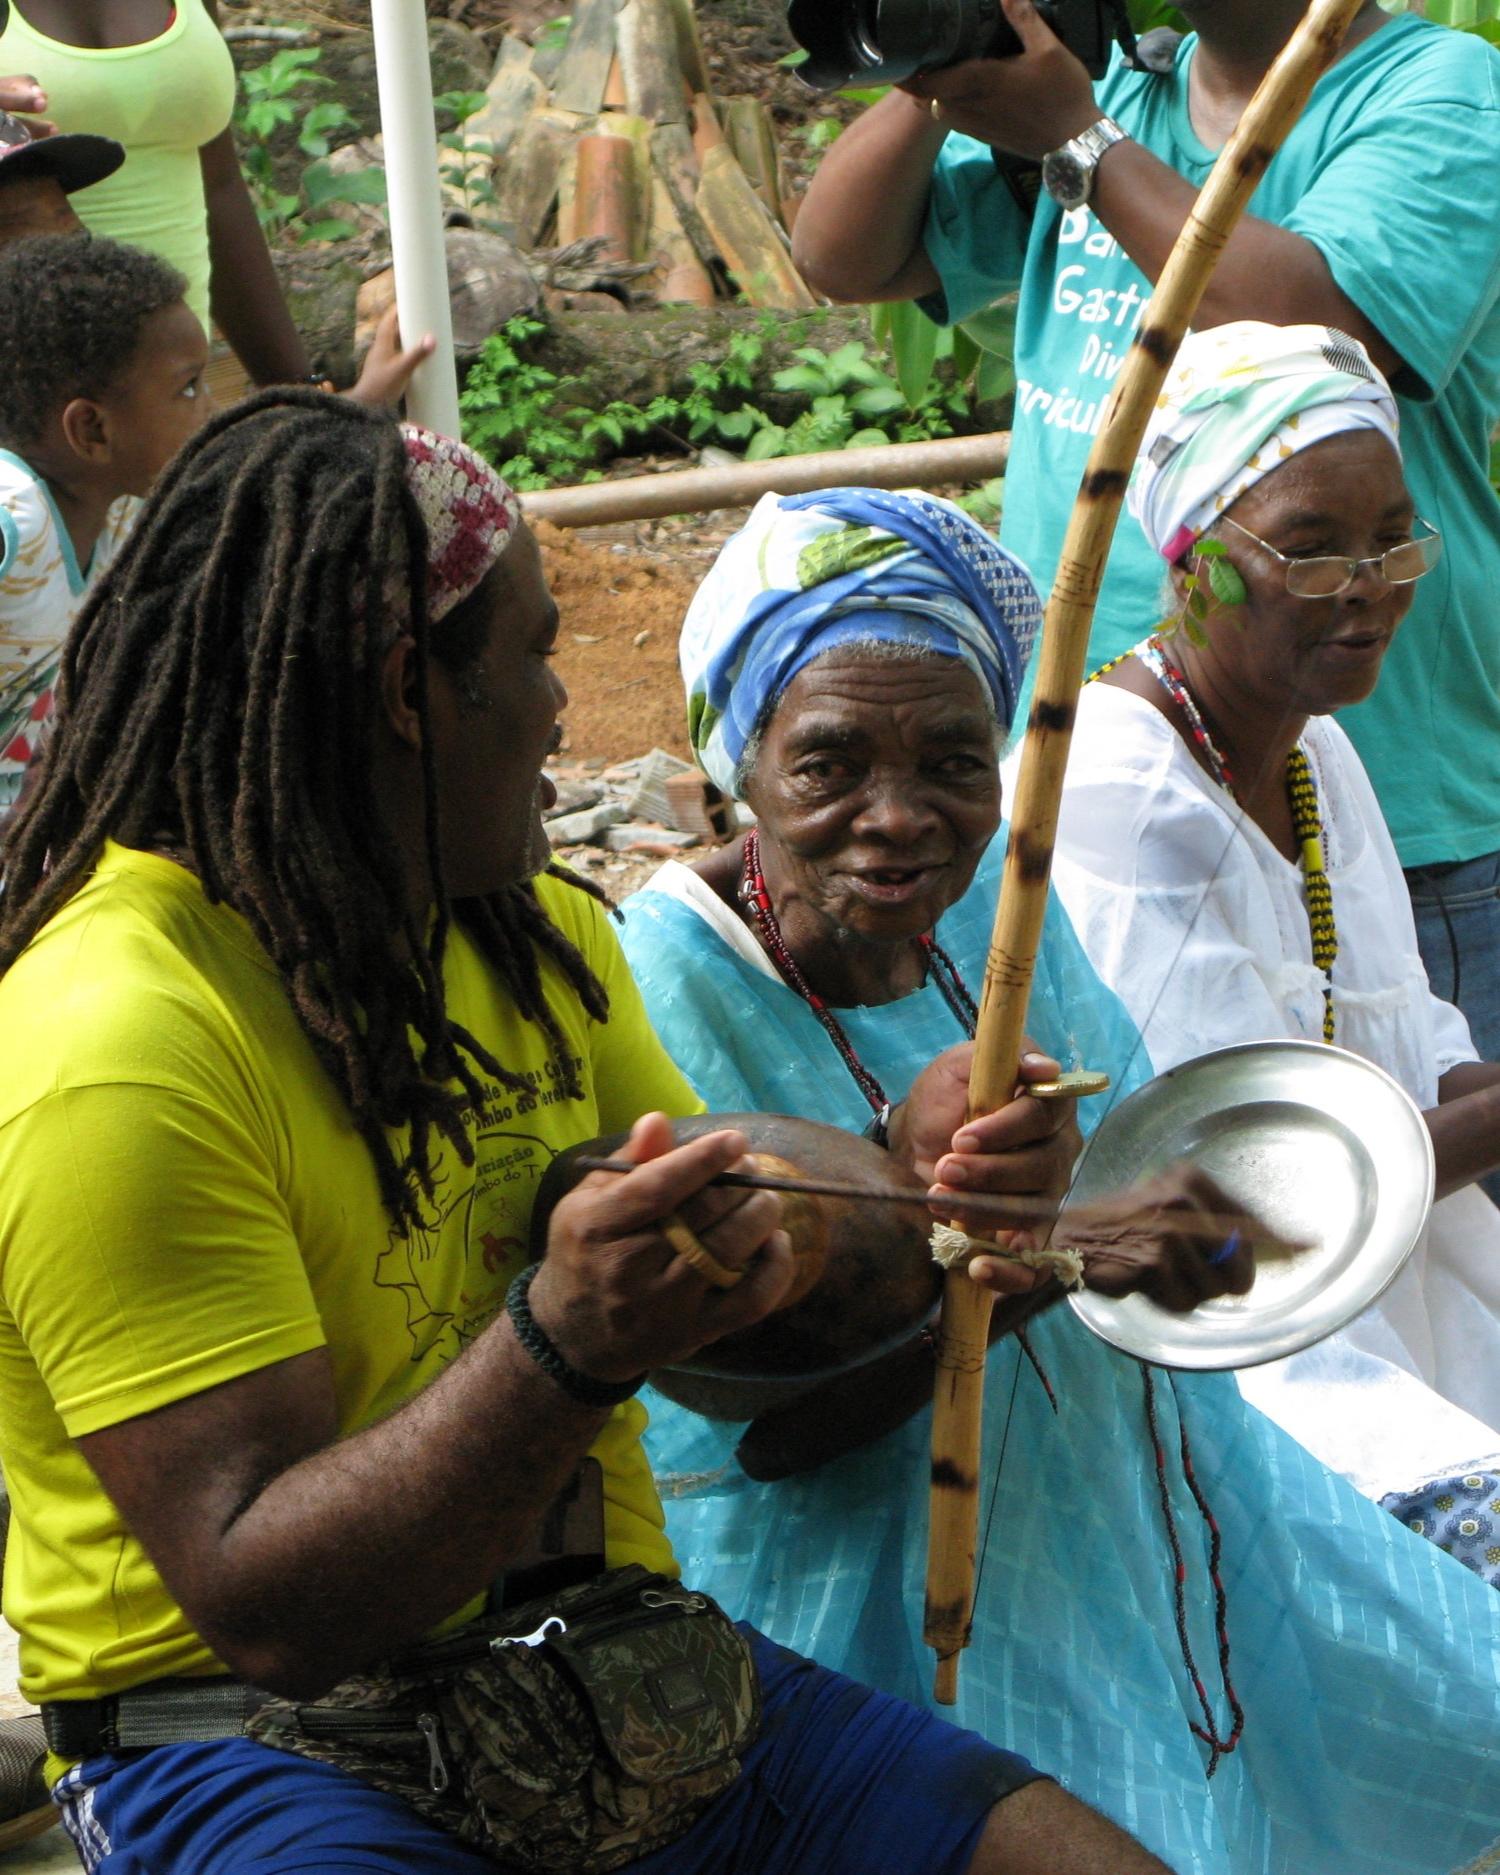 Brazil Bahia Salvador Quilombo do Tereré old woman playing plate and spoon IMG_8764 copy 2.jpeg